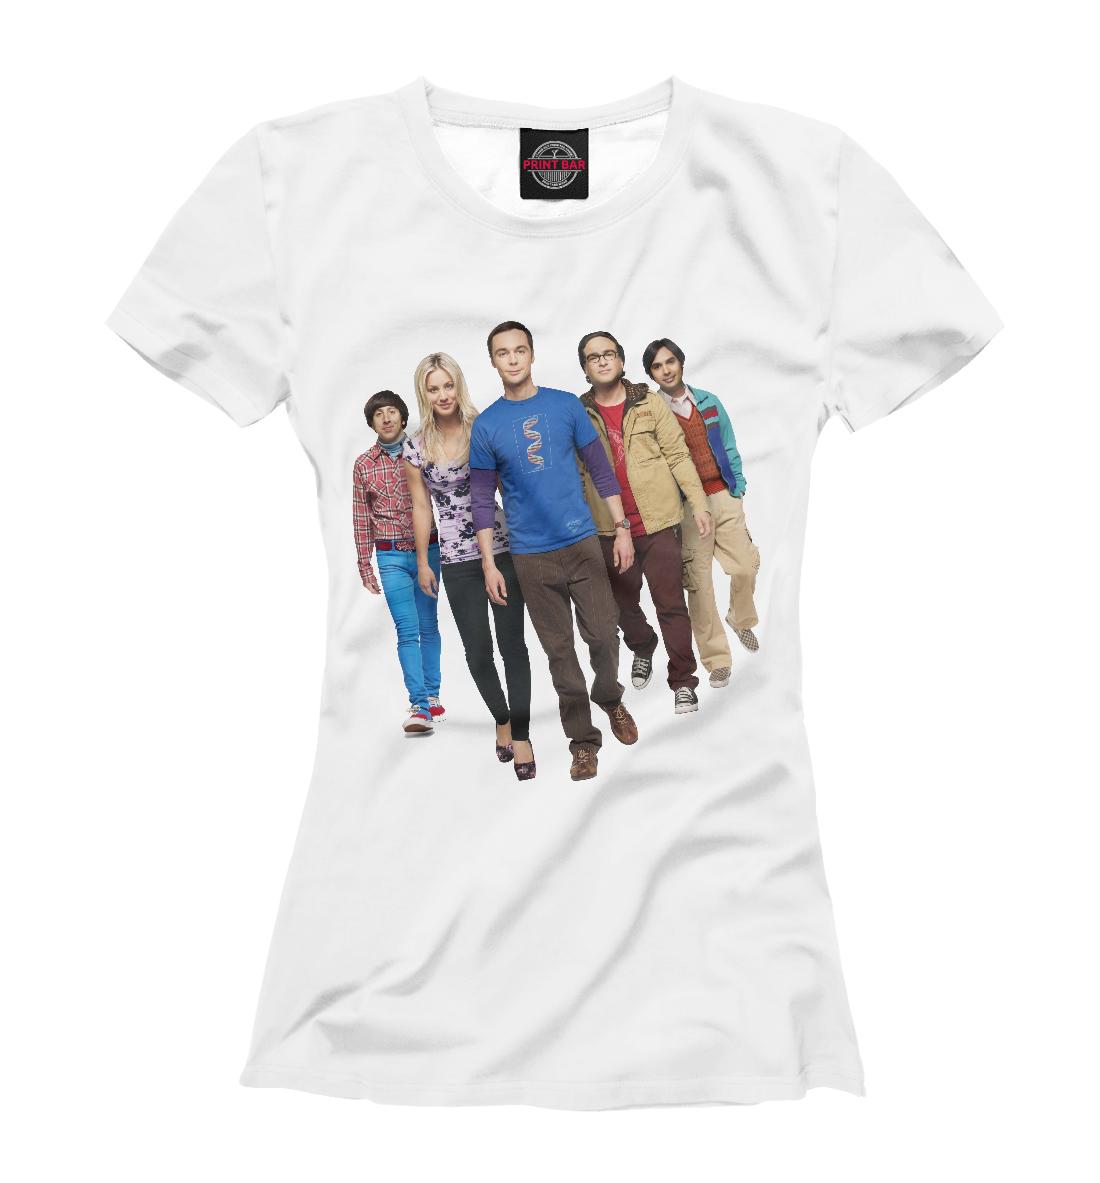 Купить The Big Bang Theory, Printbar, Футболки, TEO-422505-fut-1